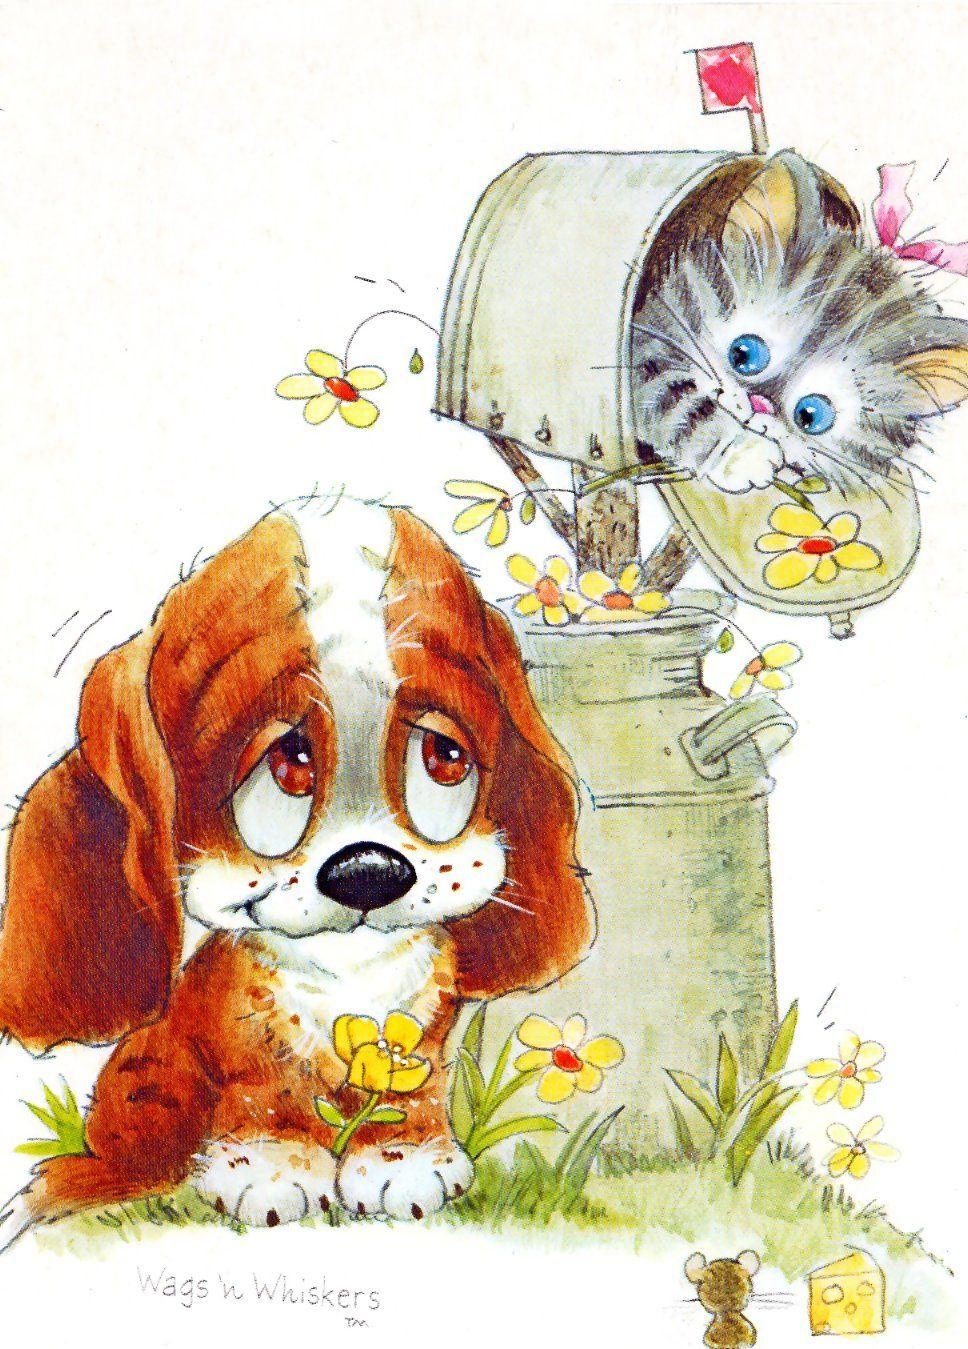 Perro Y Gato Ilusgreg Giordano Dibujos De Perros Dibujos